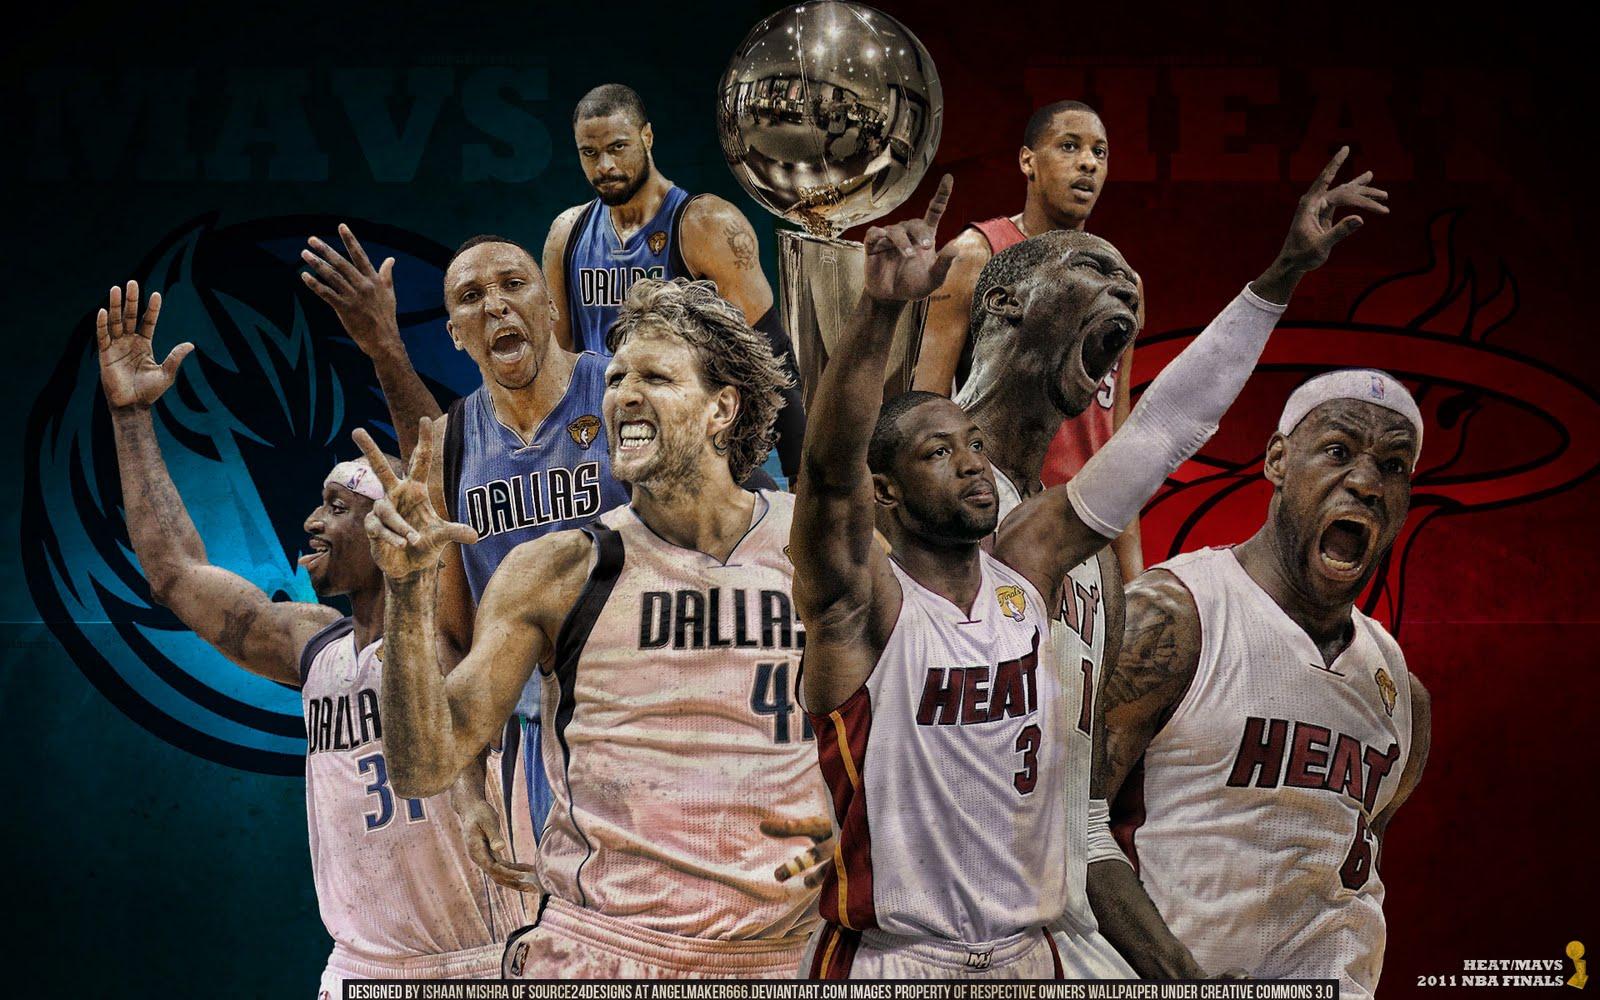 http://3.bp.blogspot.com/-8IbUNC73Pvg/TfWl5Esz95I/AAAAAAAAFtM/XWH0qeP4GcA/s1600/Heat-Mavs-2011-NBA-Finals-Widescreen-Wallpaper-BasketWallpapers.com-.jpg